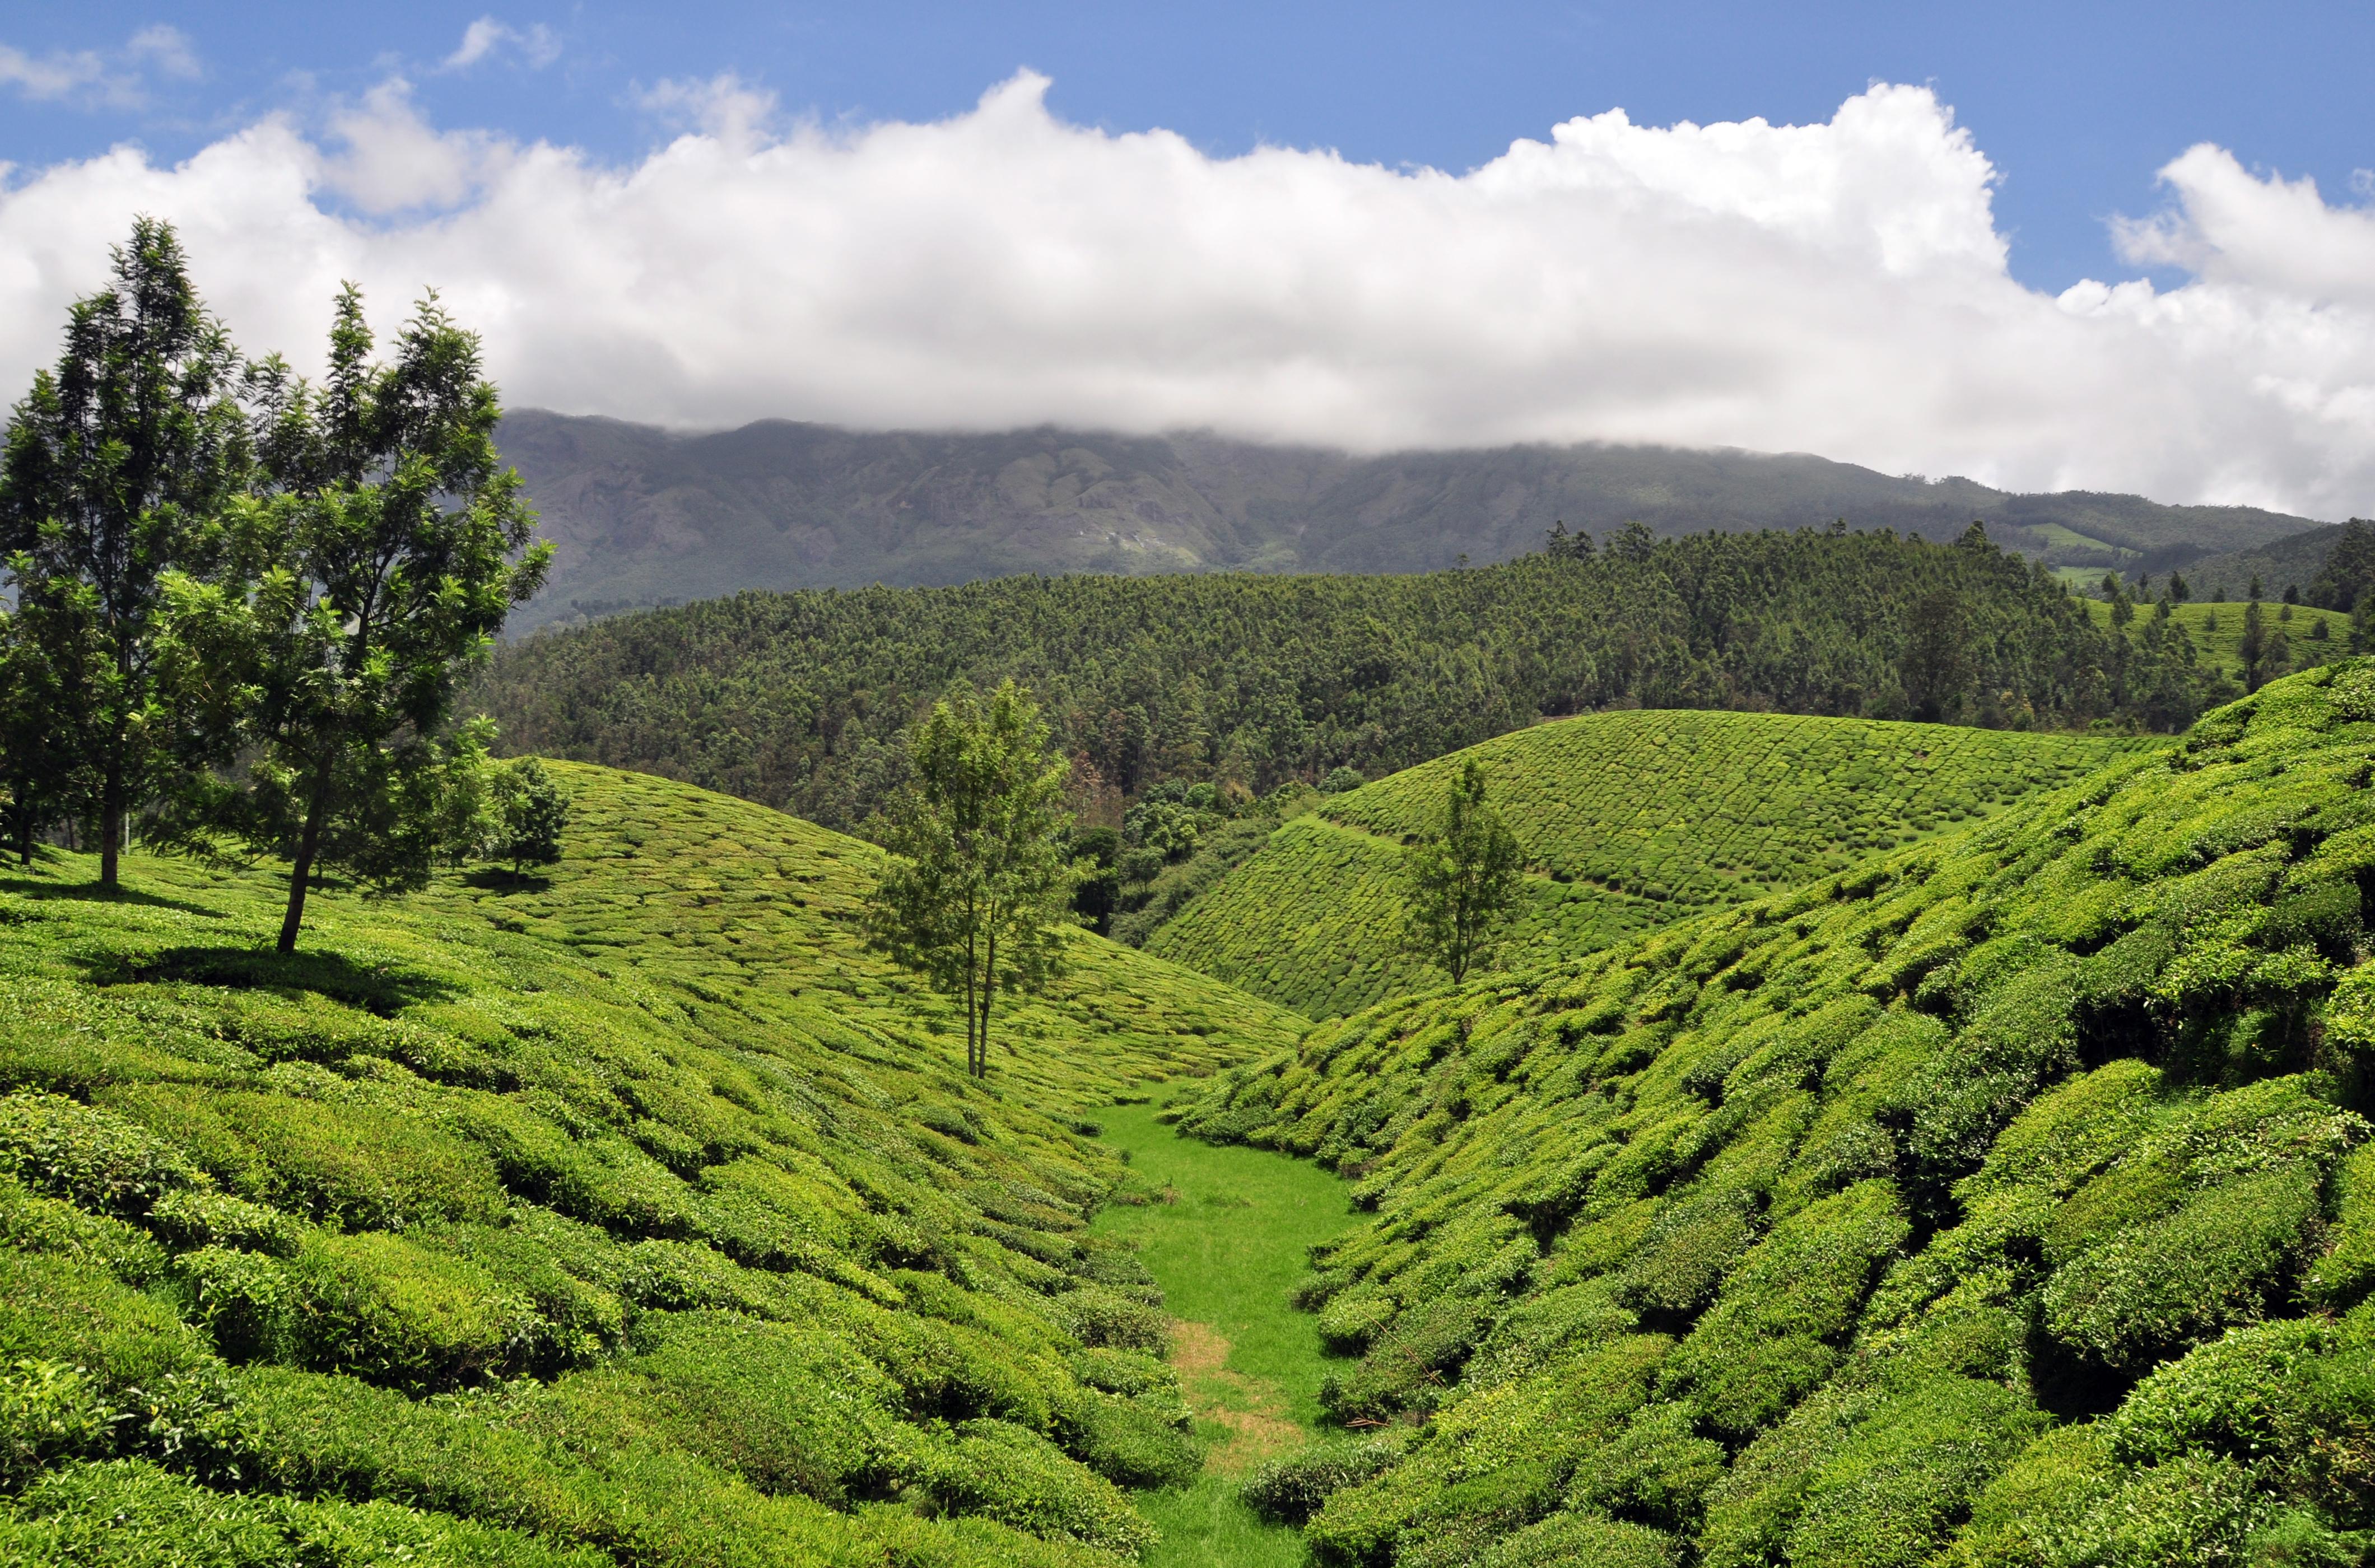 Photo Credit http://commons.wikimedia.org/wiki/File:Munnar_Tea_Plantation.jpg